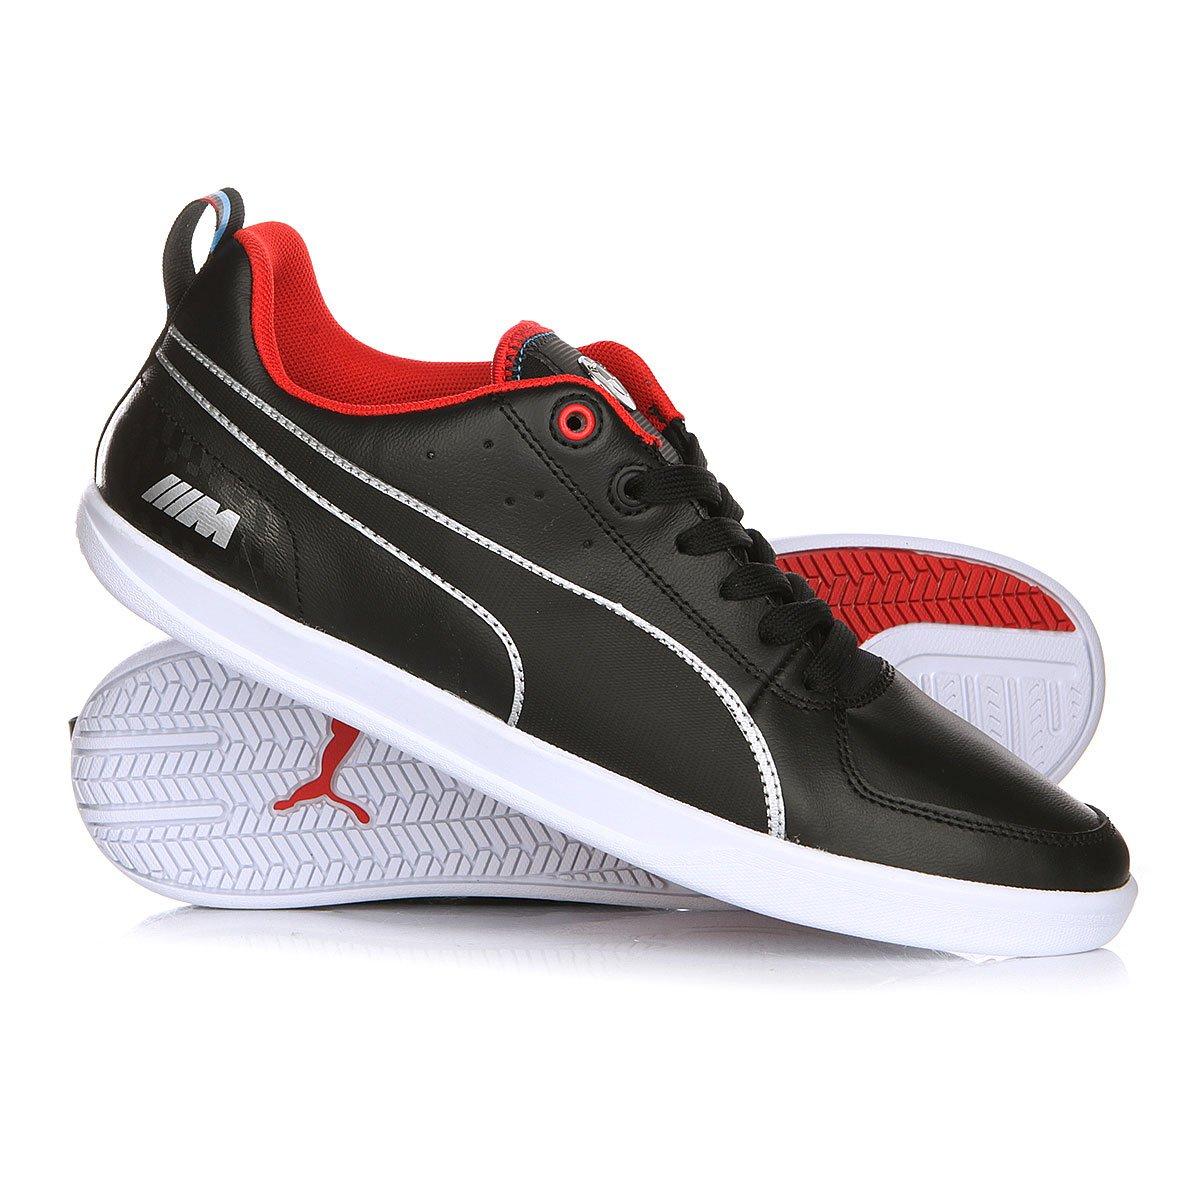 81222f330eee114 Купить кеды Puma Bmw M Power Black/White/High Risk Red в интернет ...